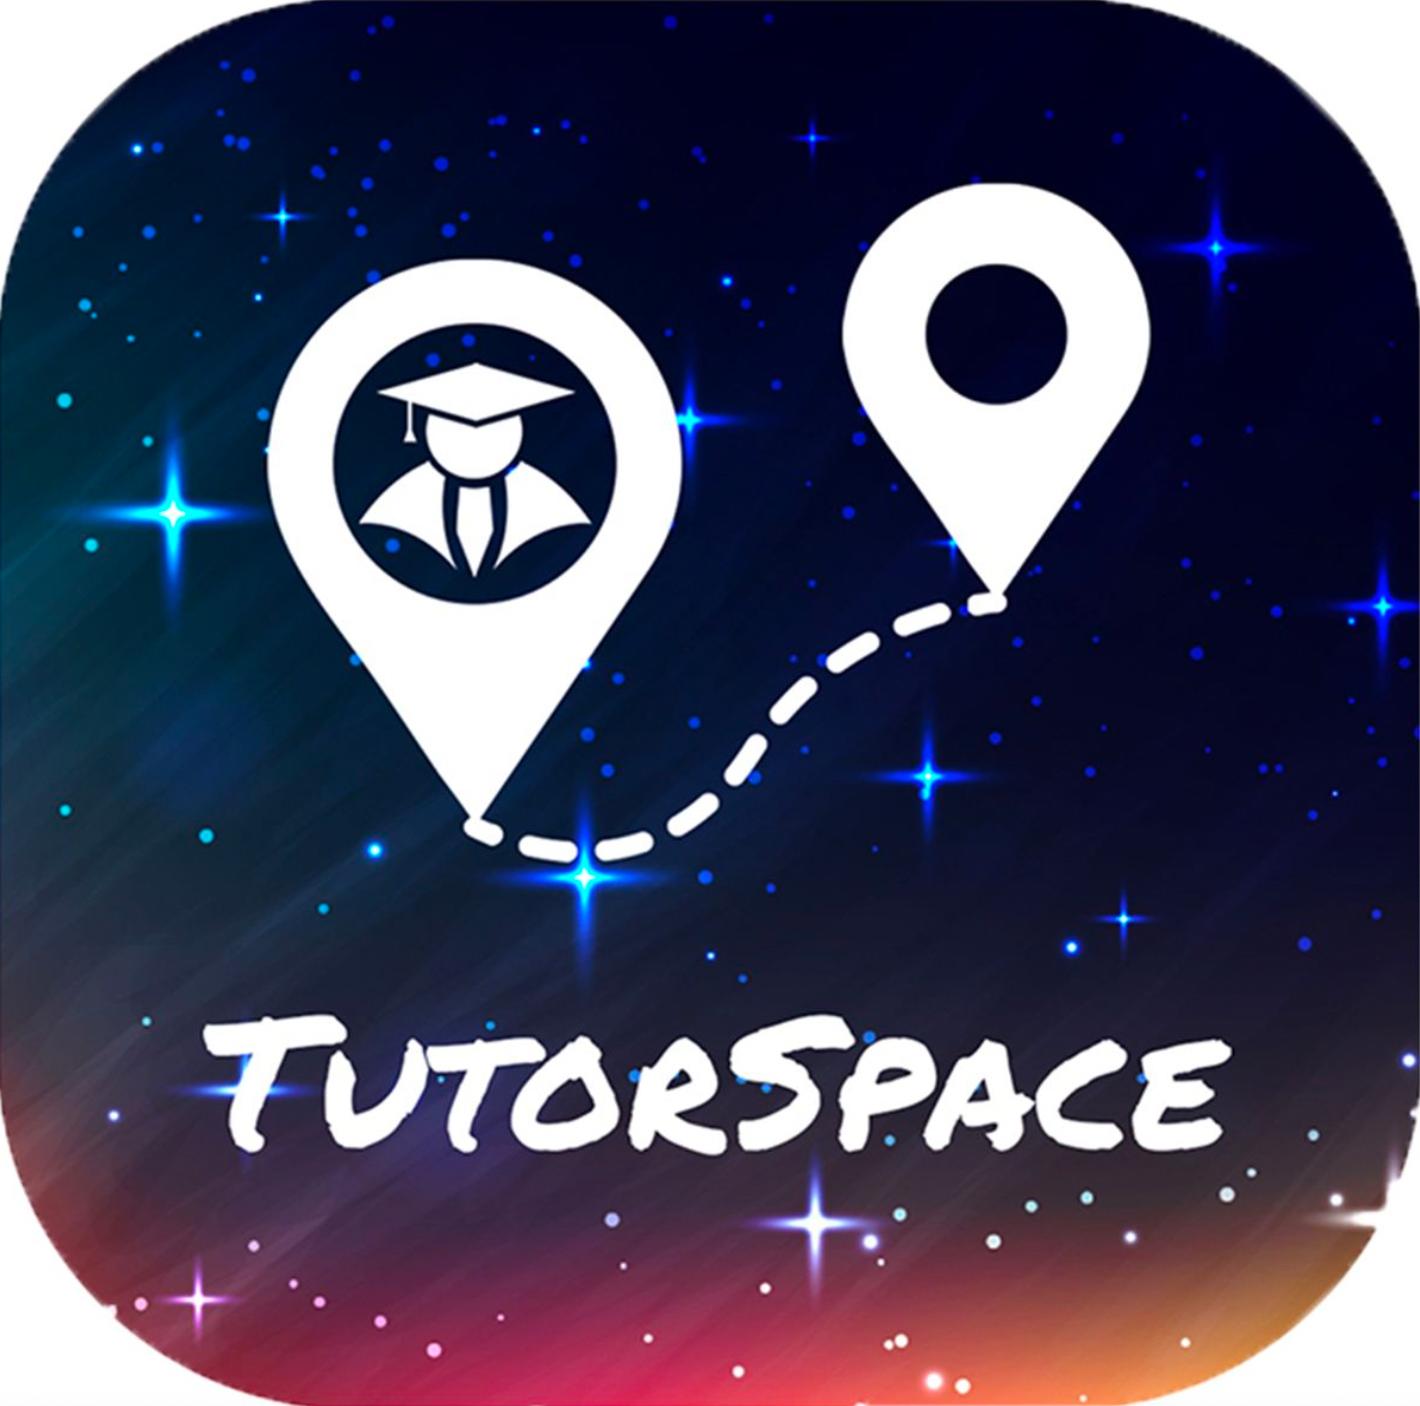 Tutorspace Logo